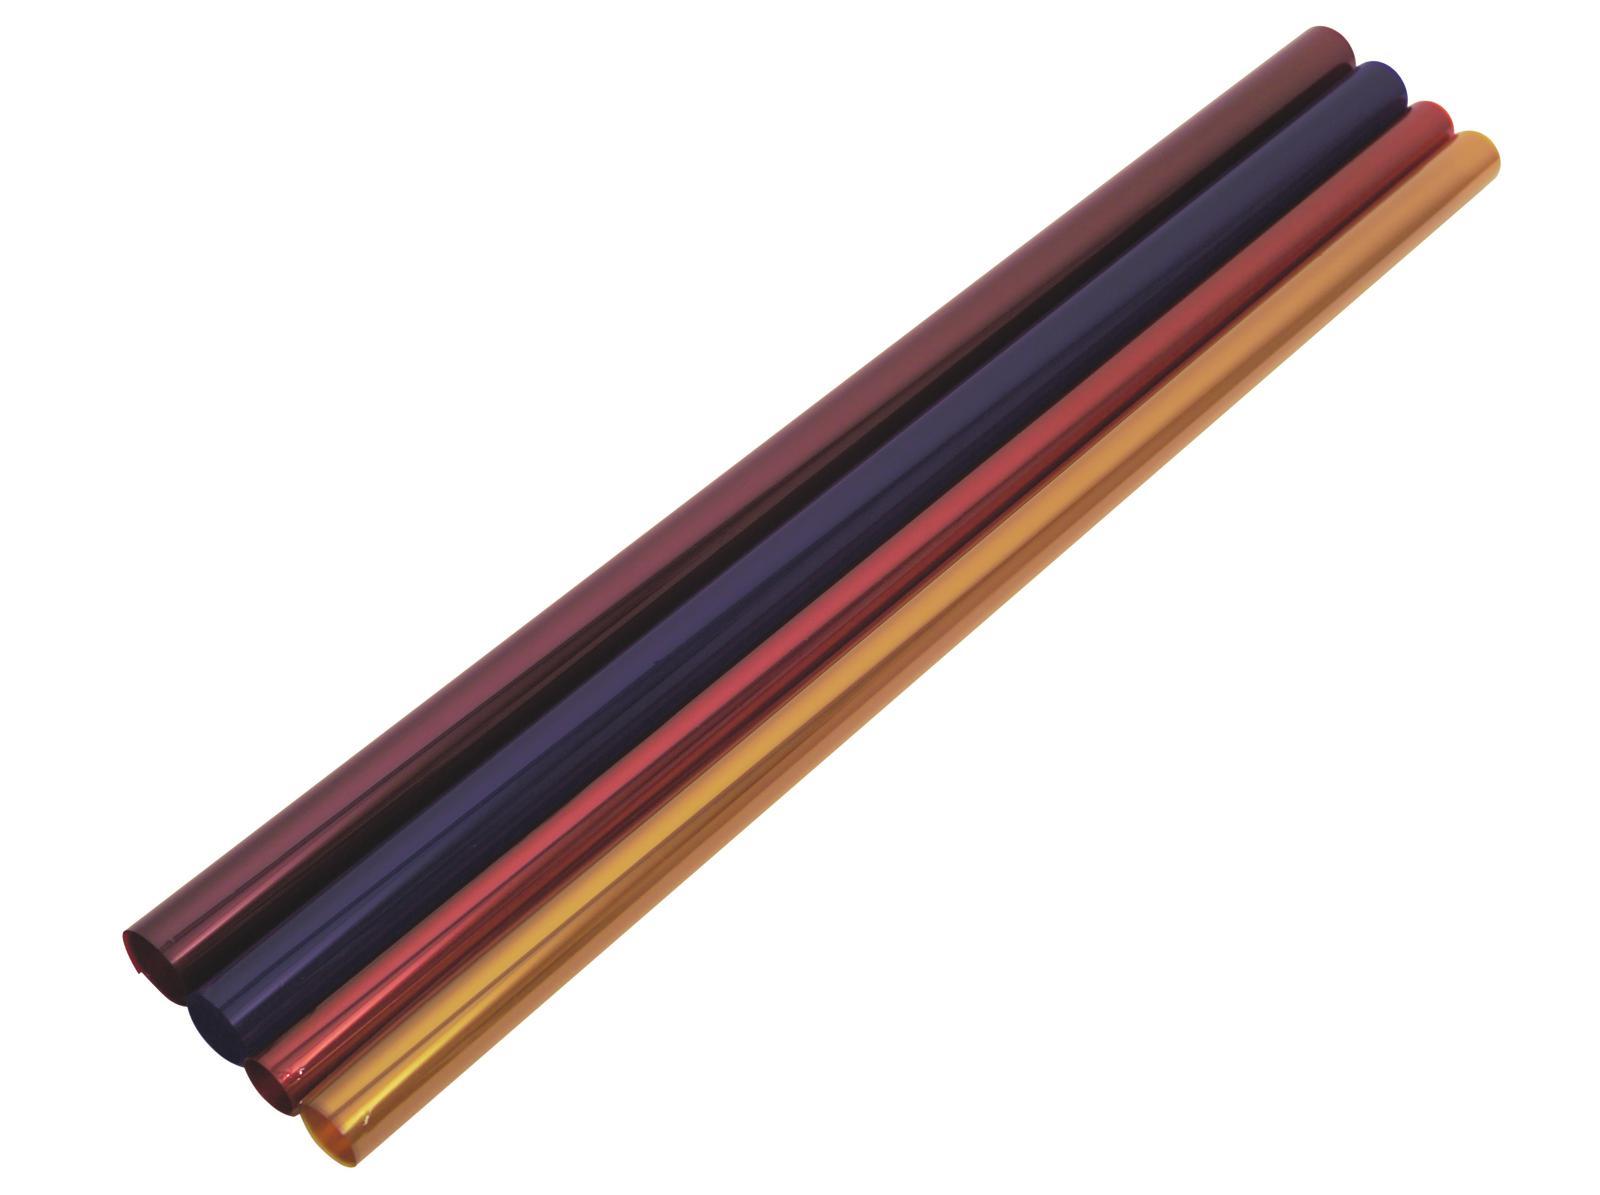 Gelatina Rotolo Filtro Per Tubo neon 165 122x100cm blu chiaro Eurolite